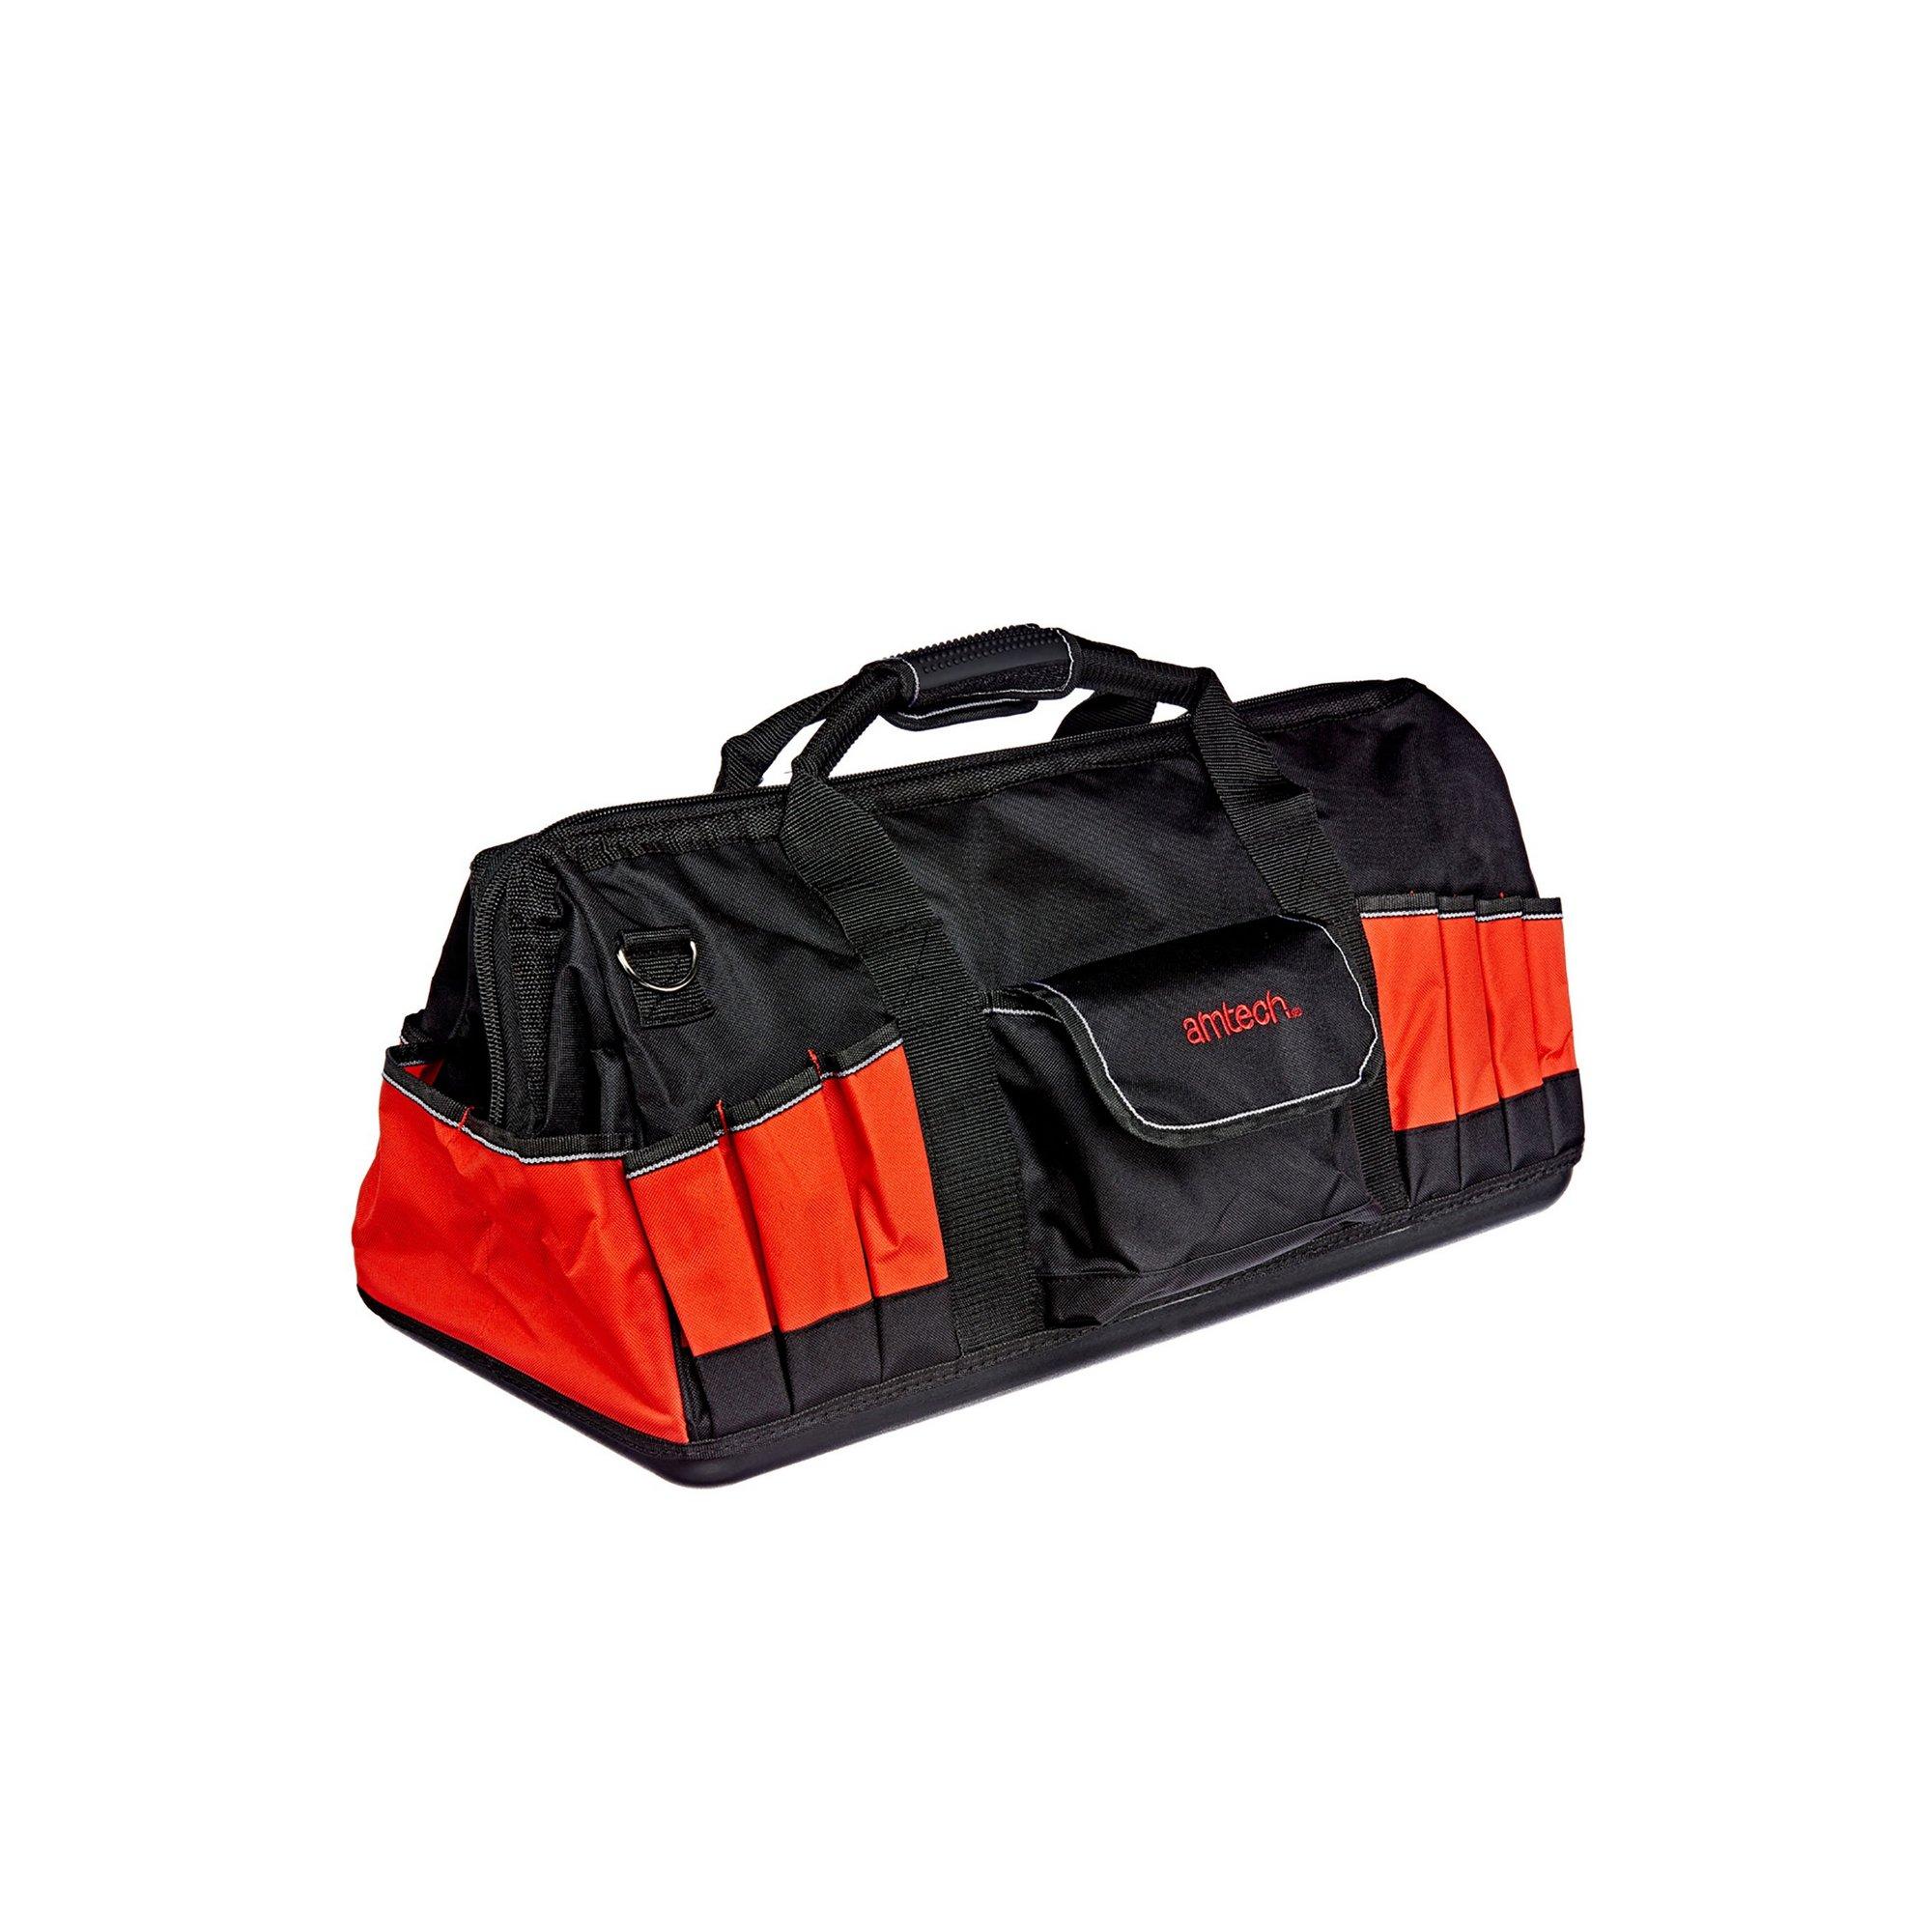 Image of 600mm Hard Base Tool Bag